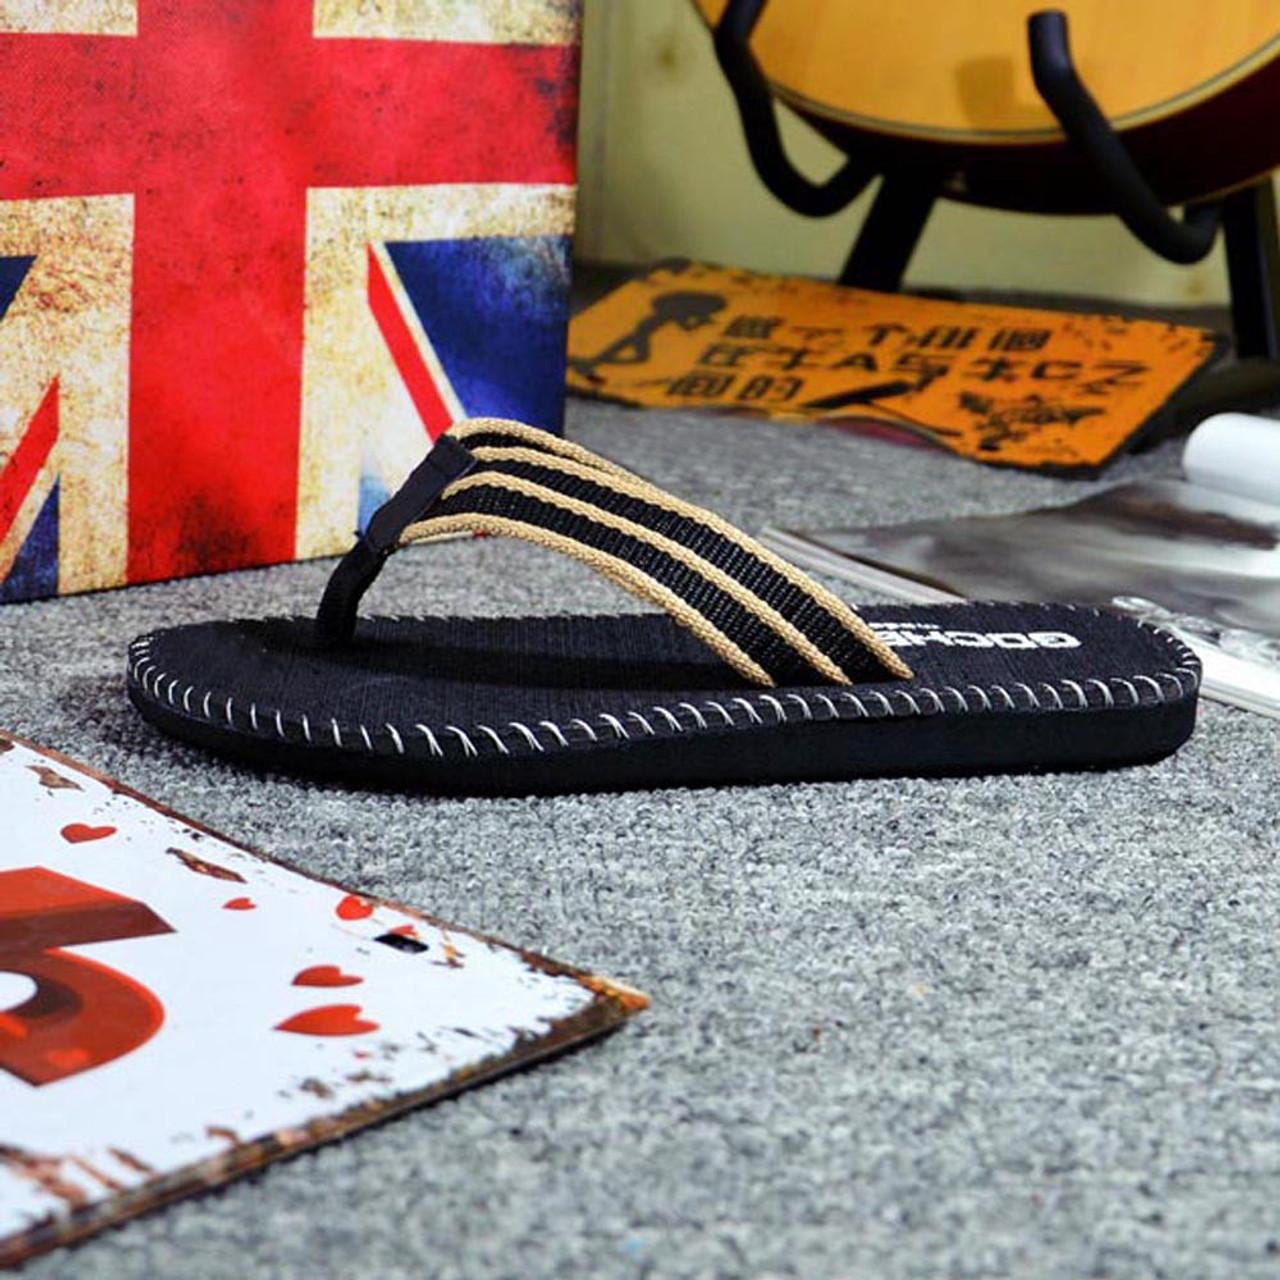 8aae5878d3f05 ... 2018 New Arrival Men Summer Flip Flops Shoes Casual Beach Sandals Male  Fashion Outdoor Slipper Flip ...